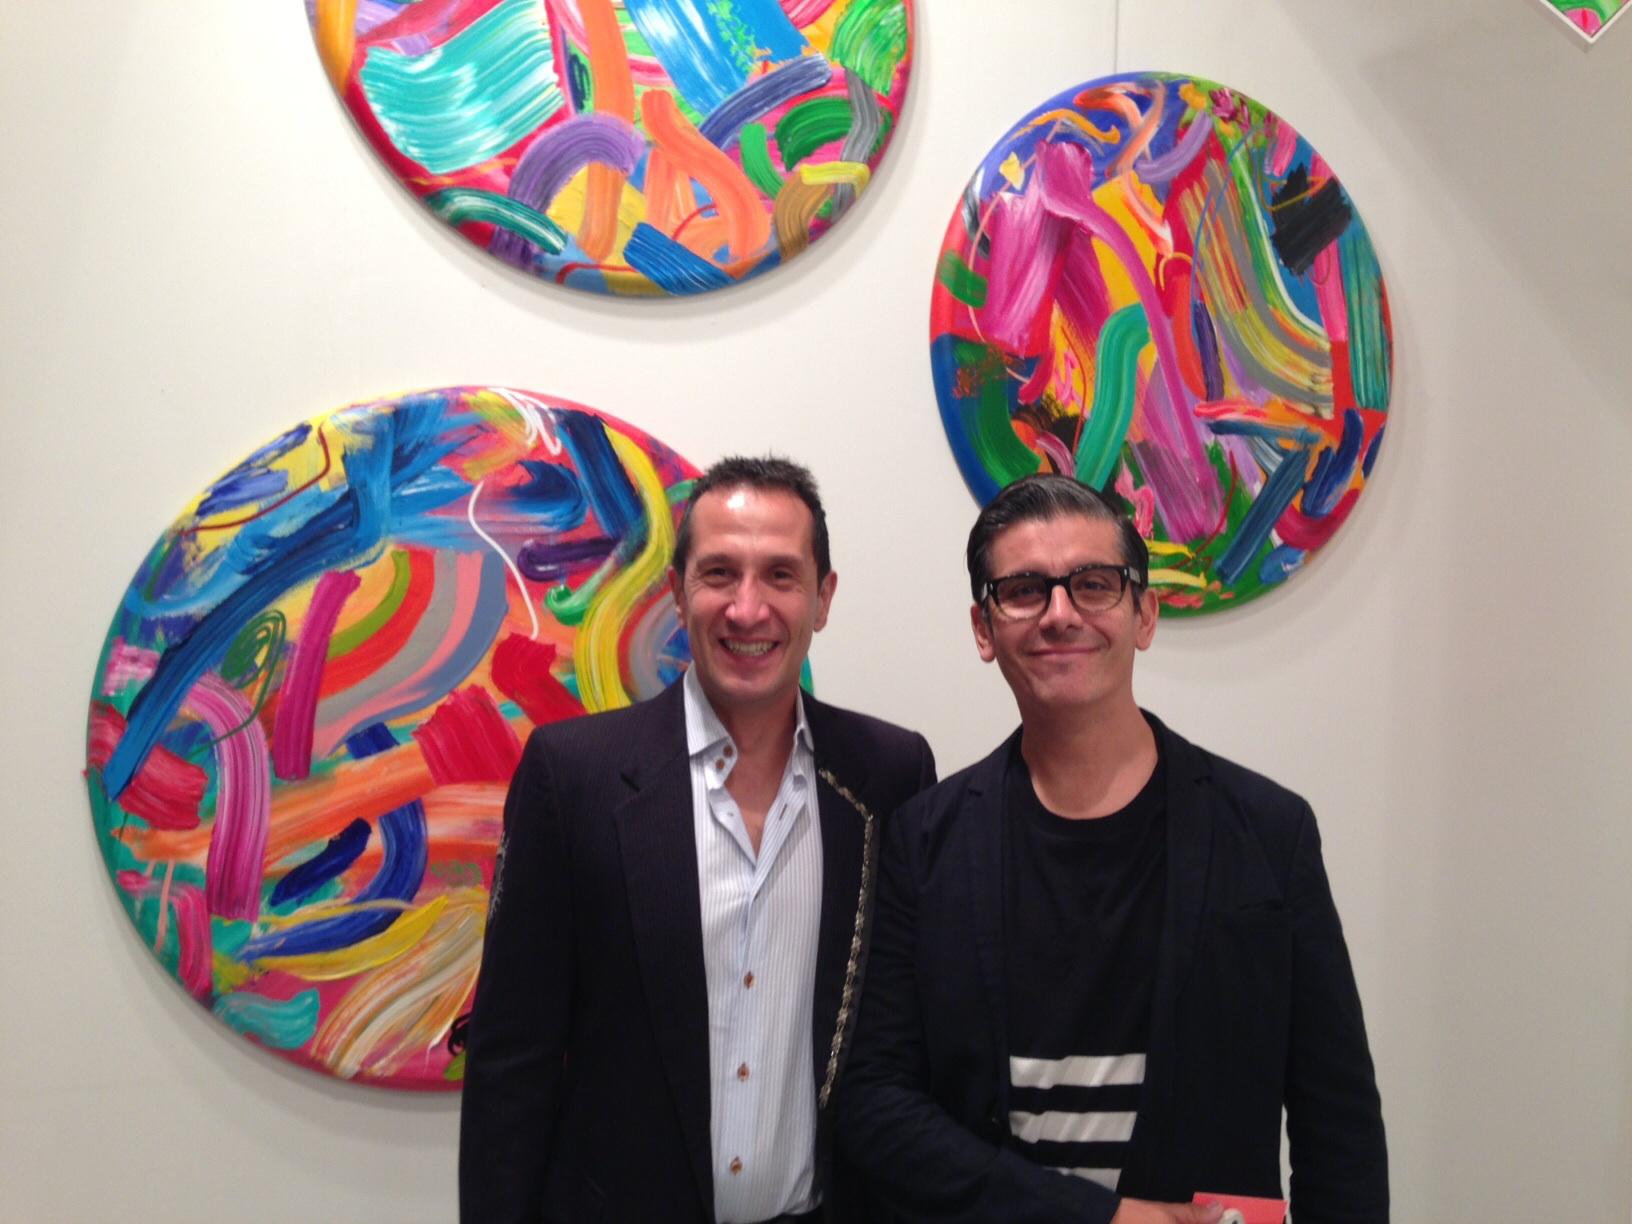 Art Miami 2013. Art Basel Miami Beach